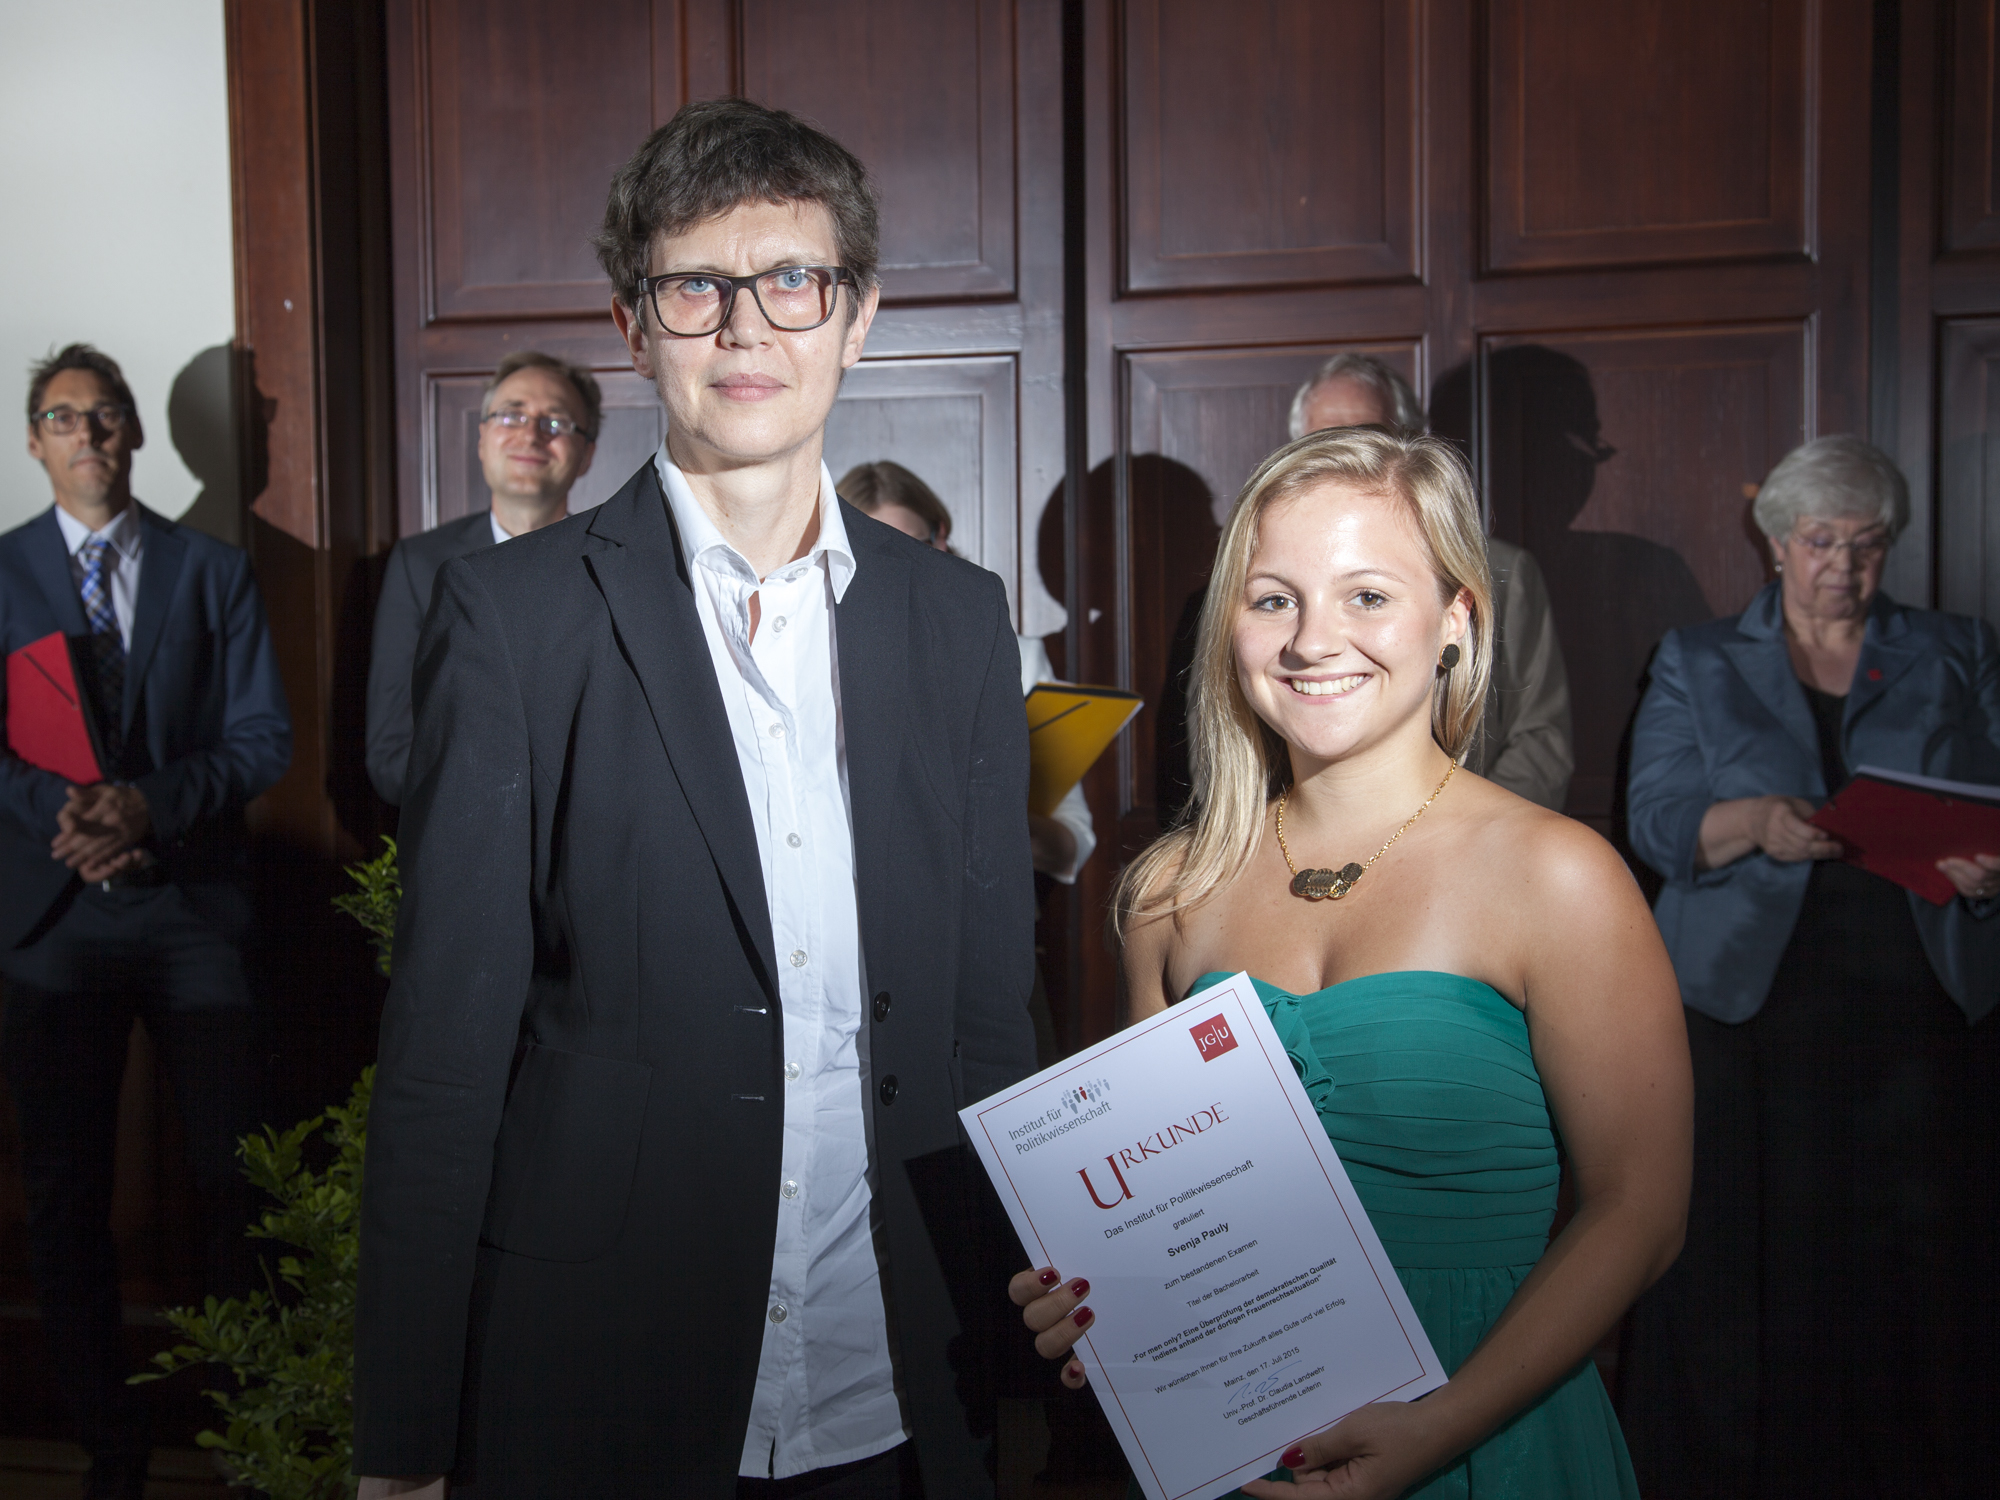 Abschlussfeier Politikwissenschaften (31)